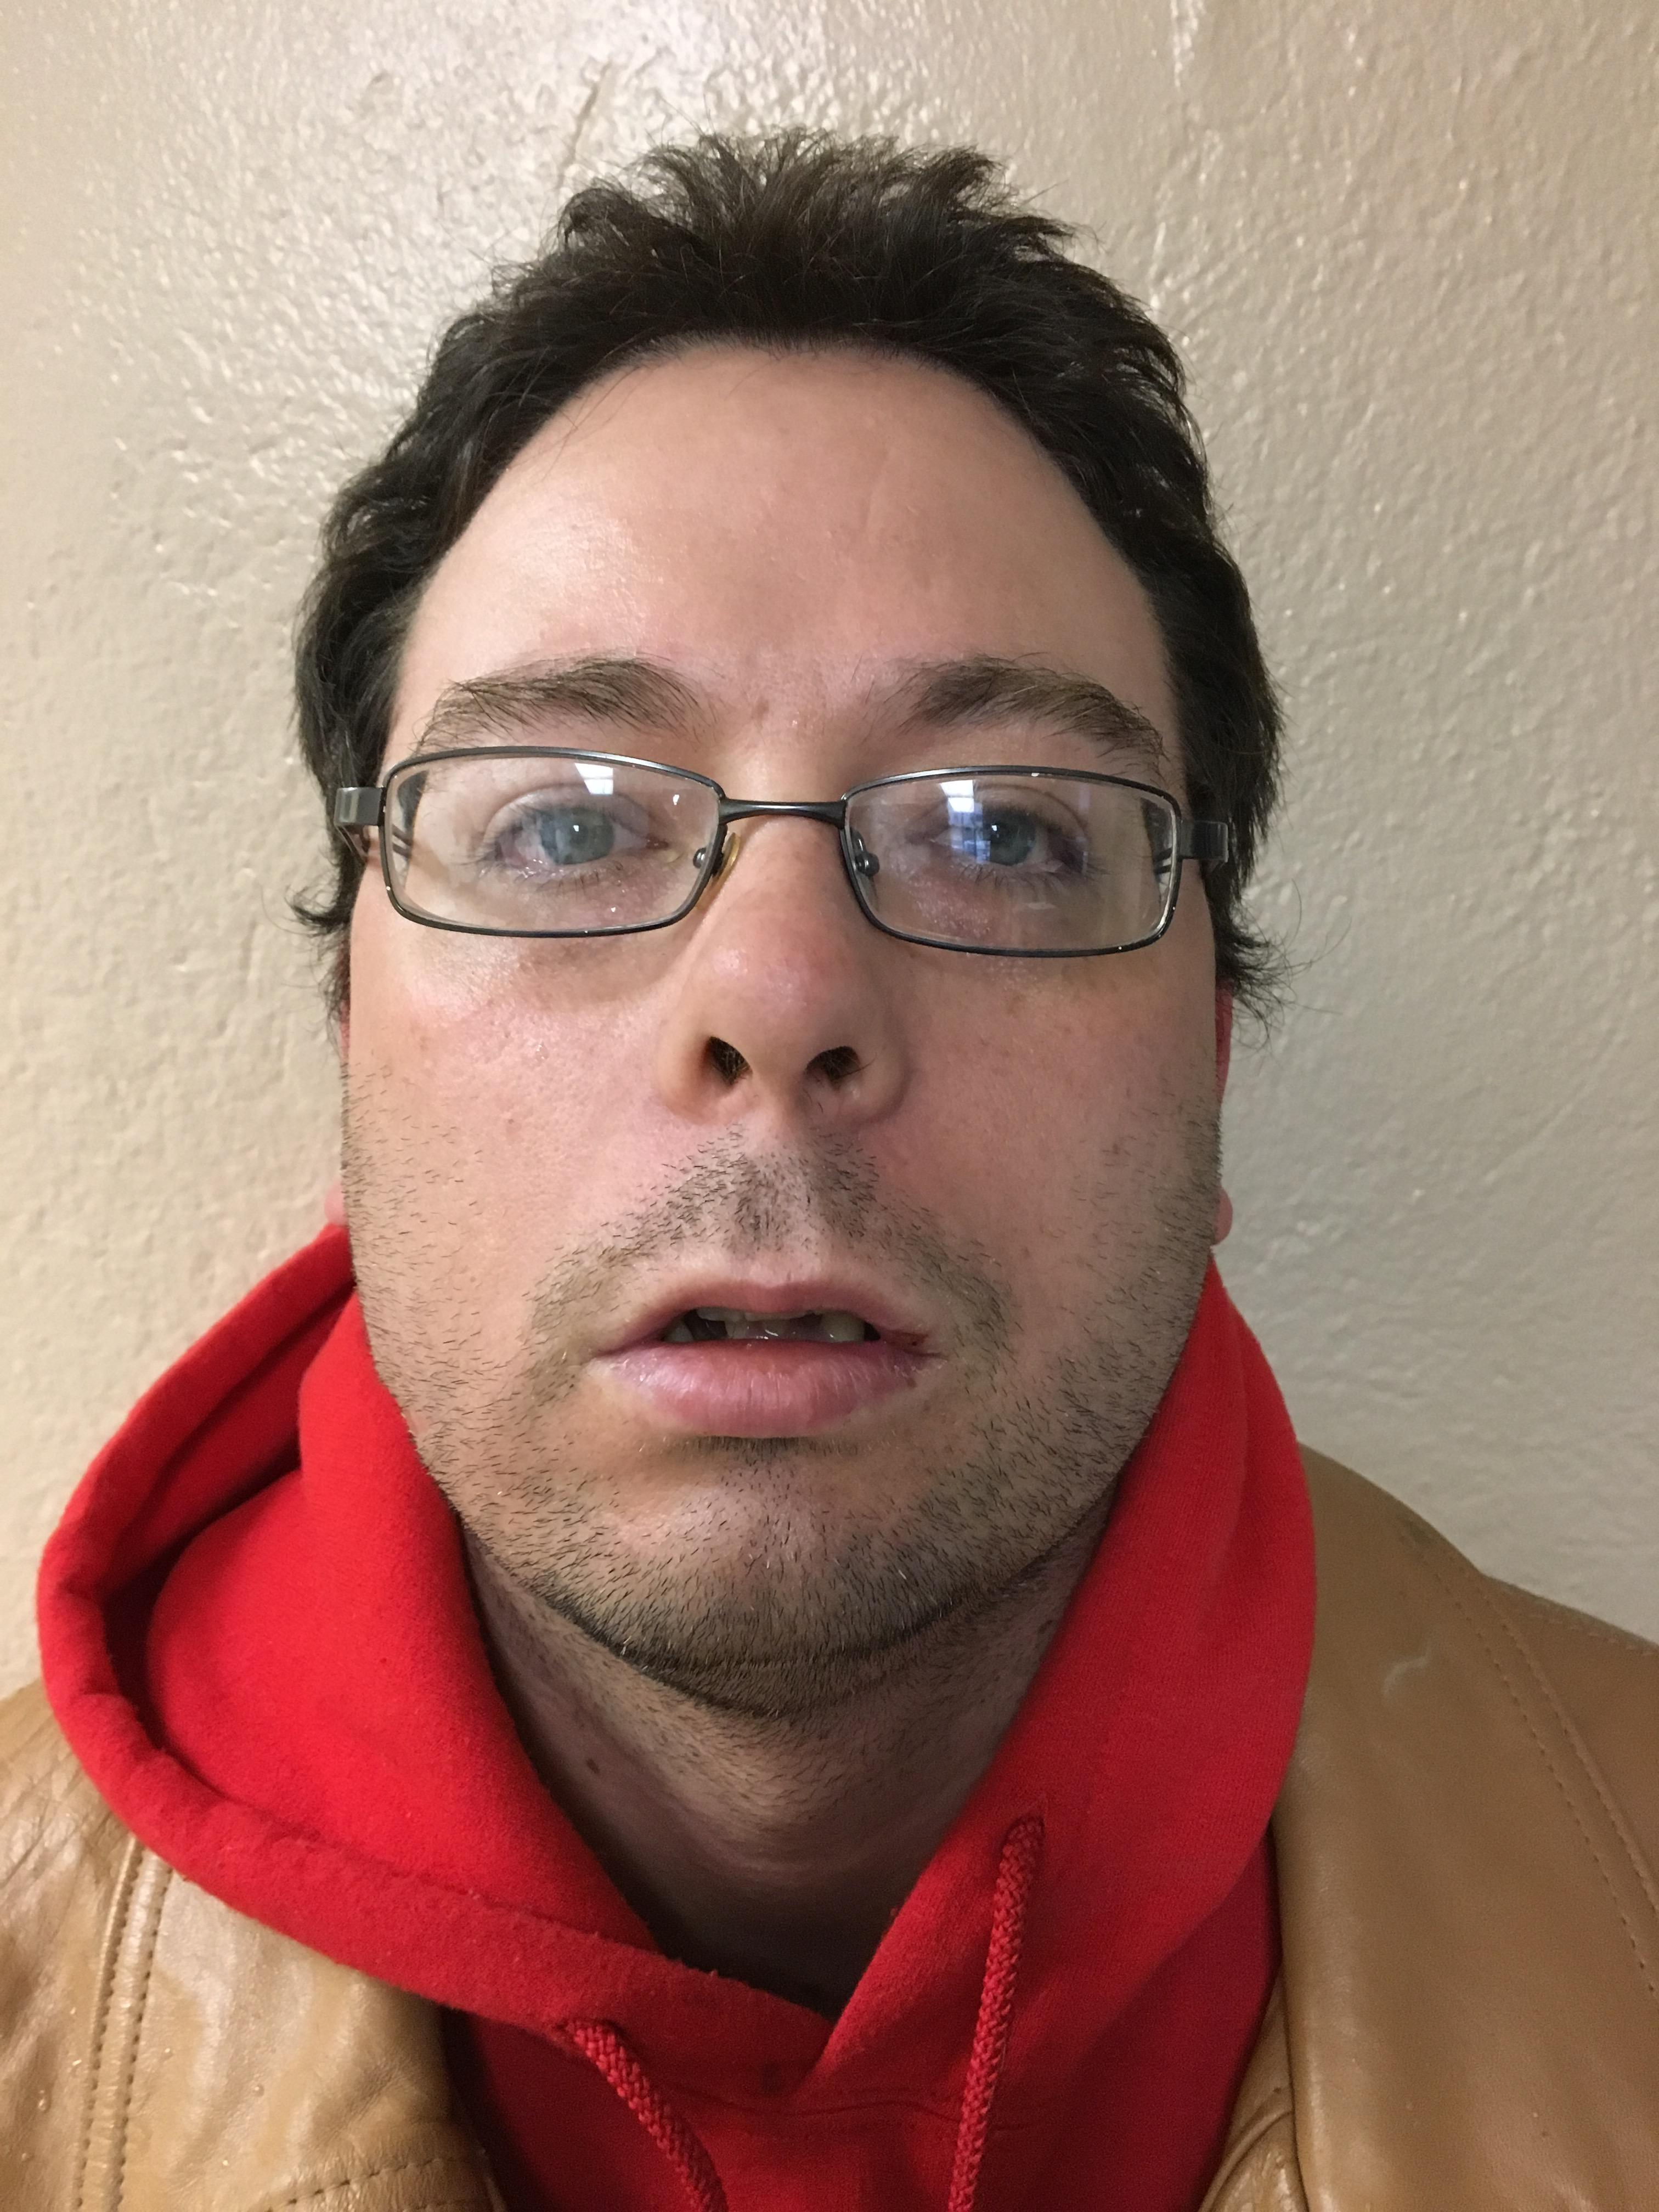 Utica new york sex offender list